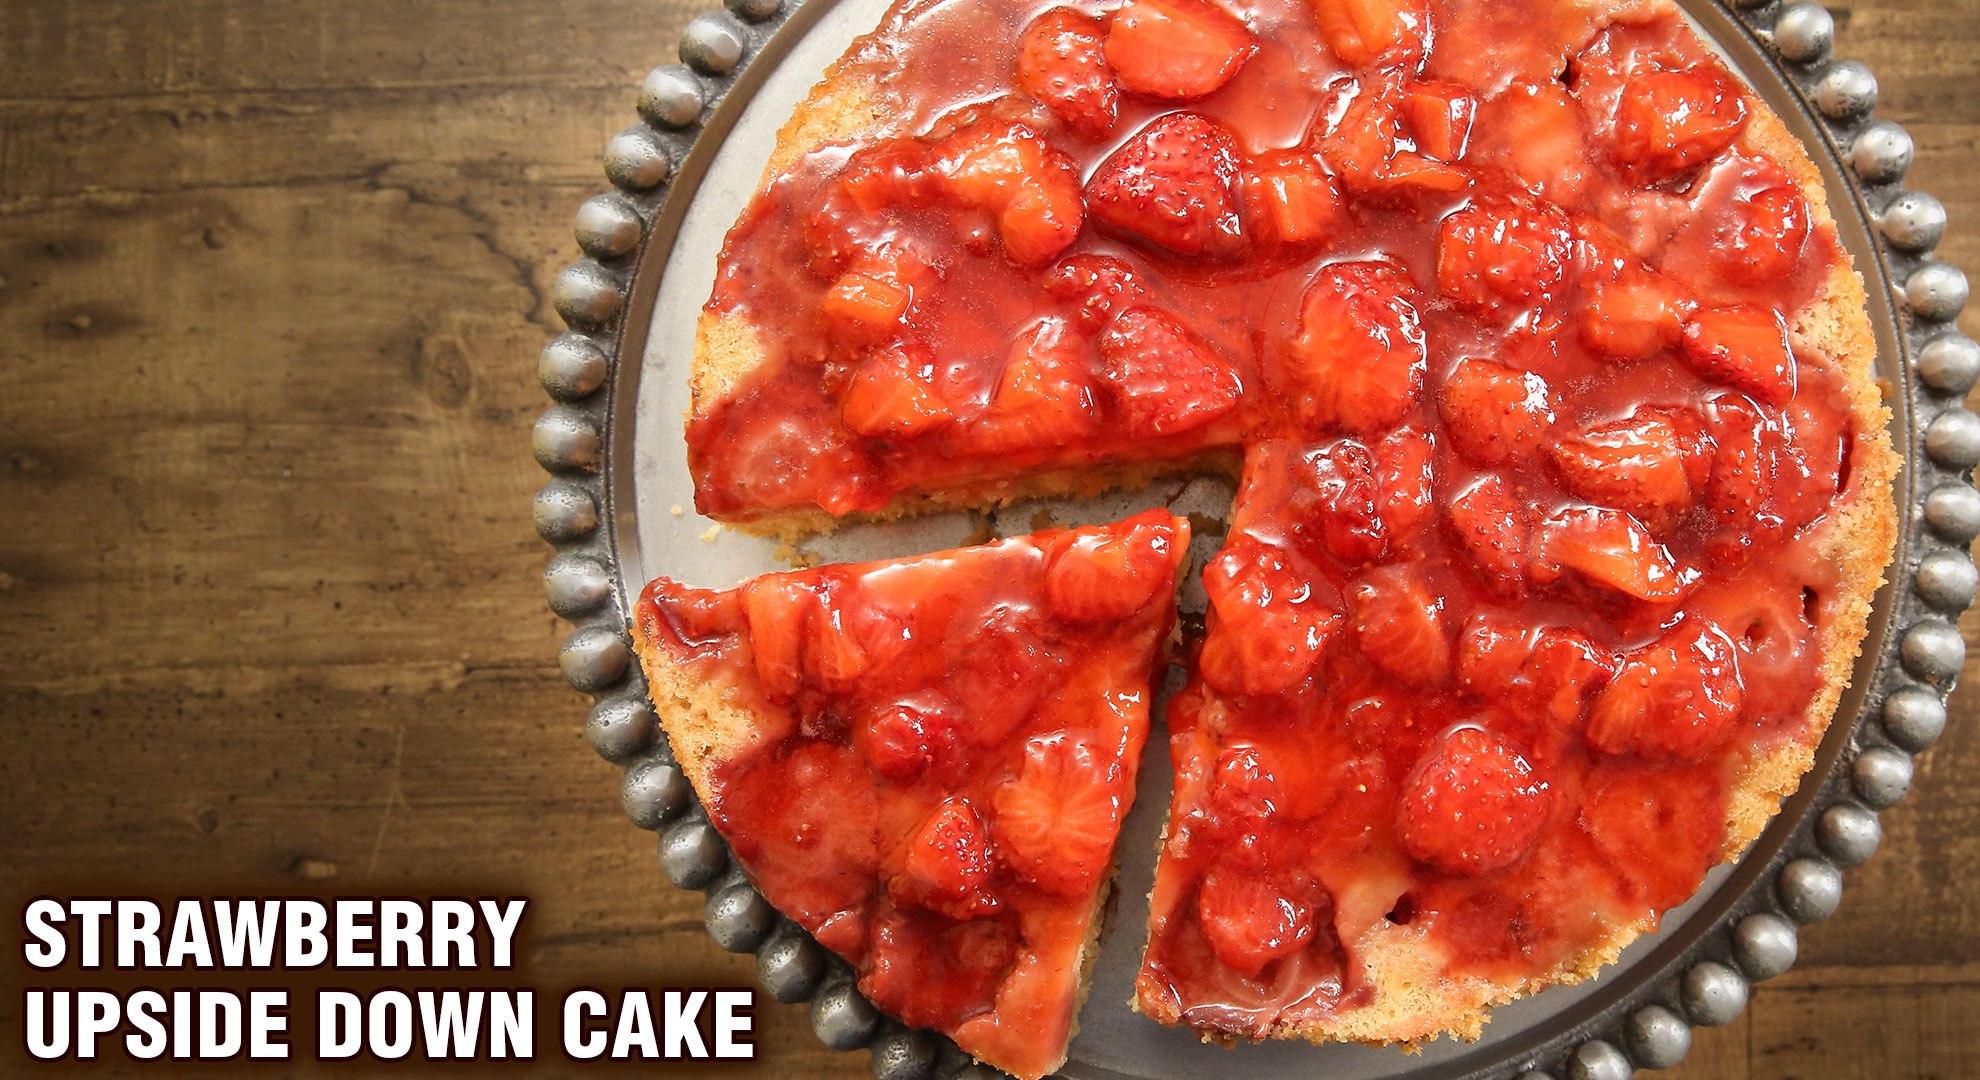 Strawberry Upside Down Cake | How To Make Upside Down Cake | Strawberry Cake | Cake Recipes | Tarika